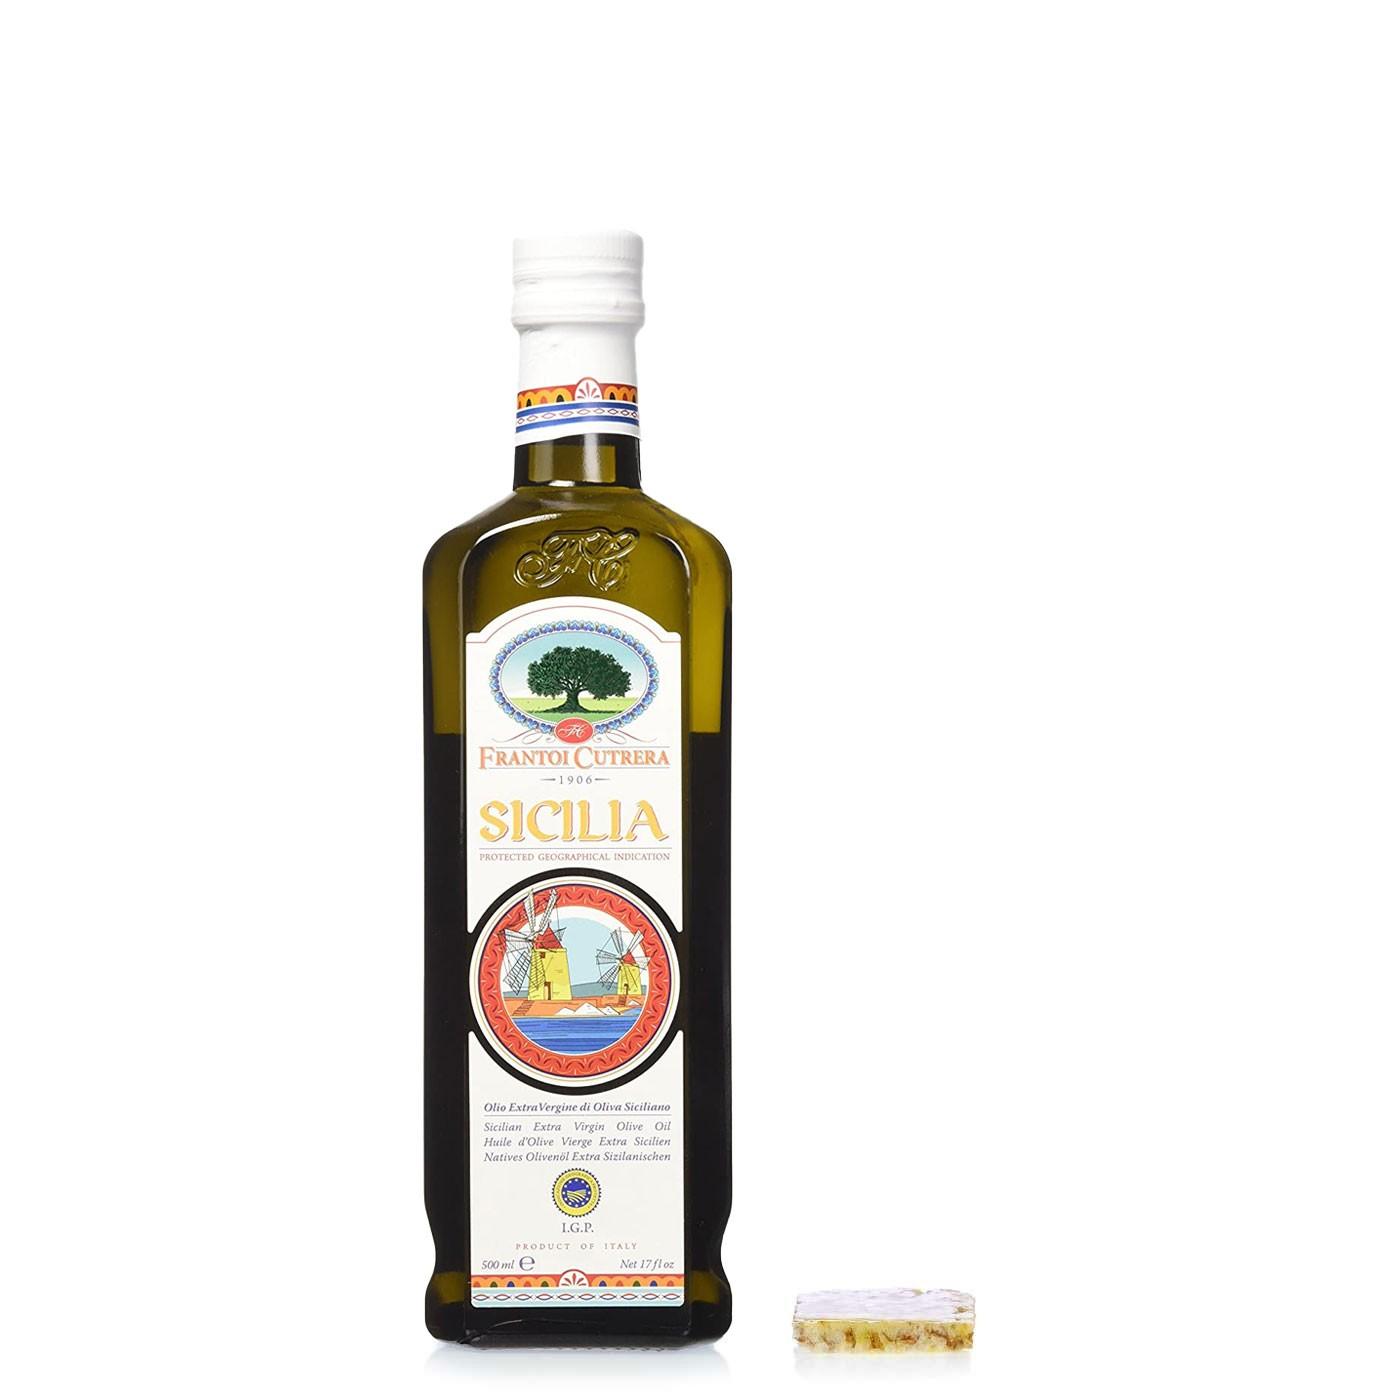 IGP Sicilia Extra Virgin Olive Oil 16.9 oz - Frantoi Cutrera | Eataly.com